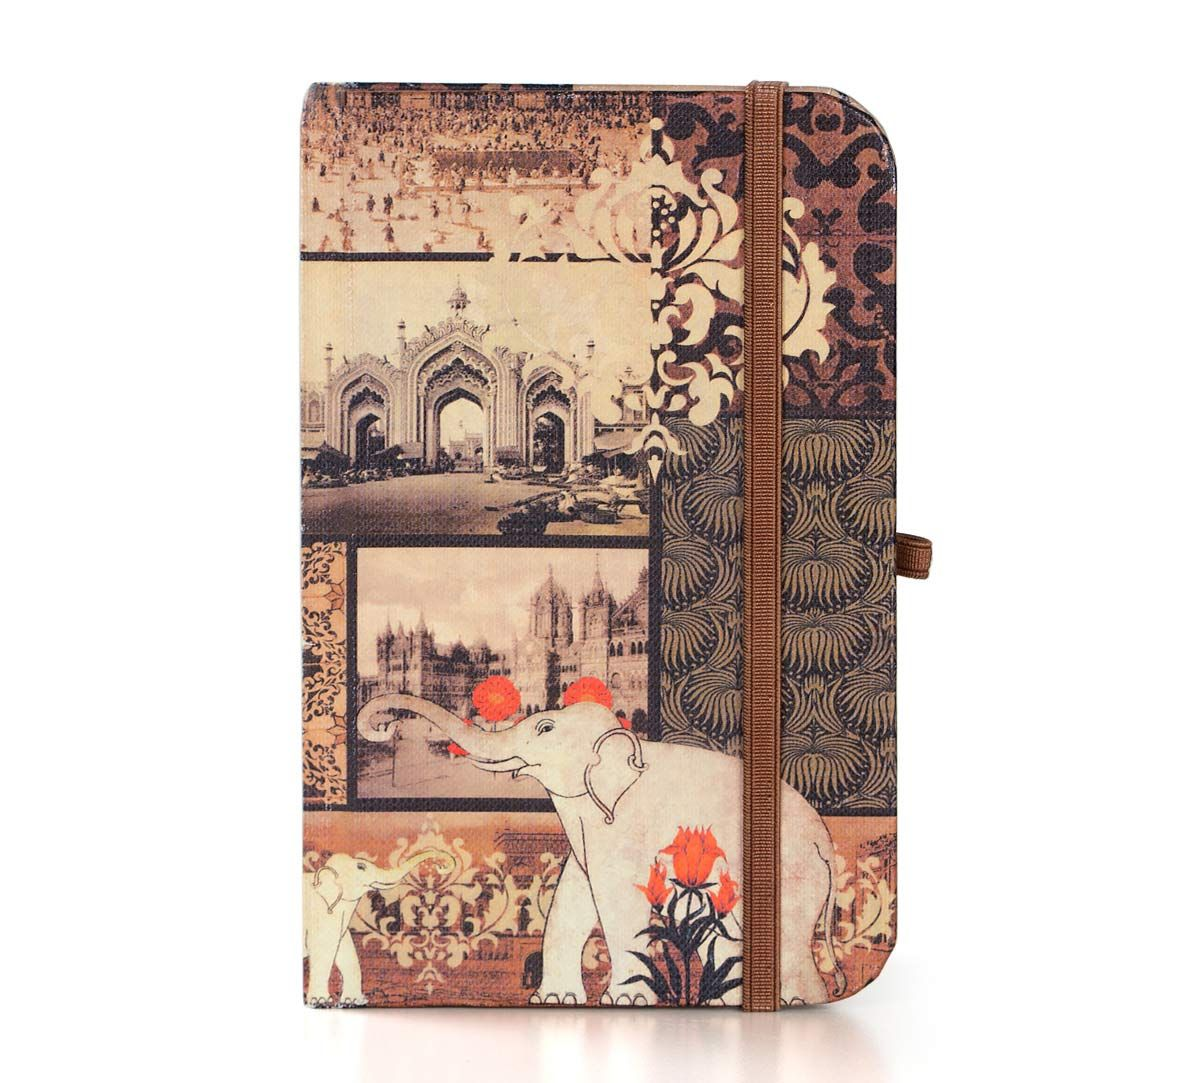 India Circus The Mughal Era Pocket Diary